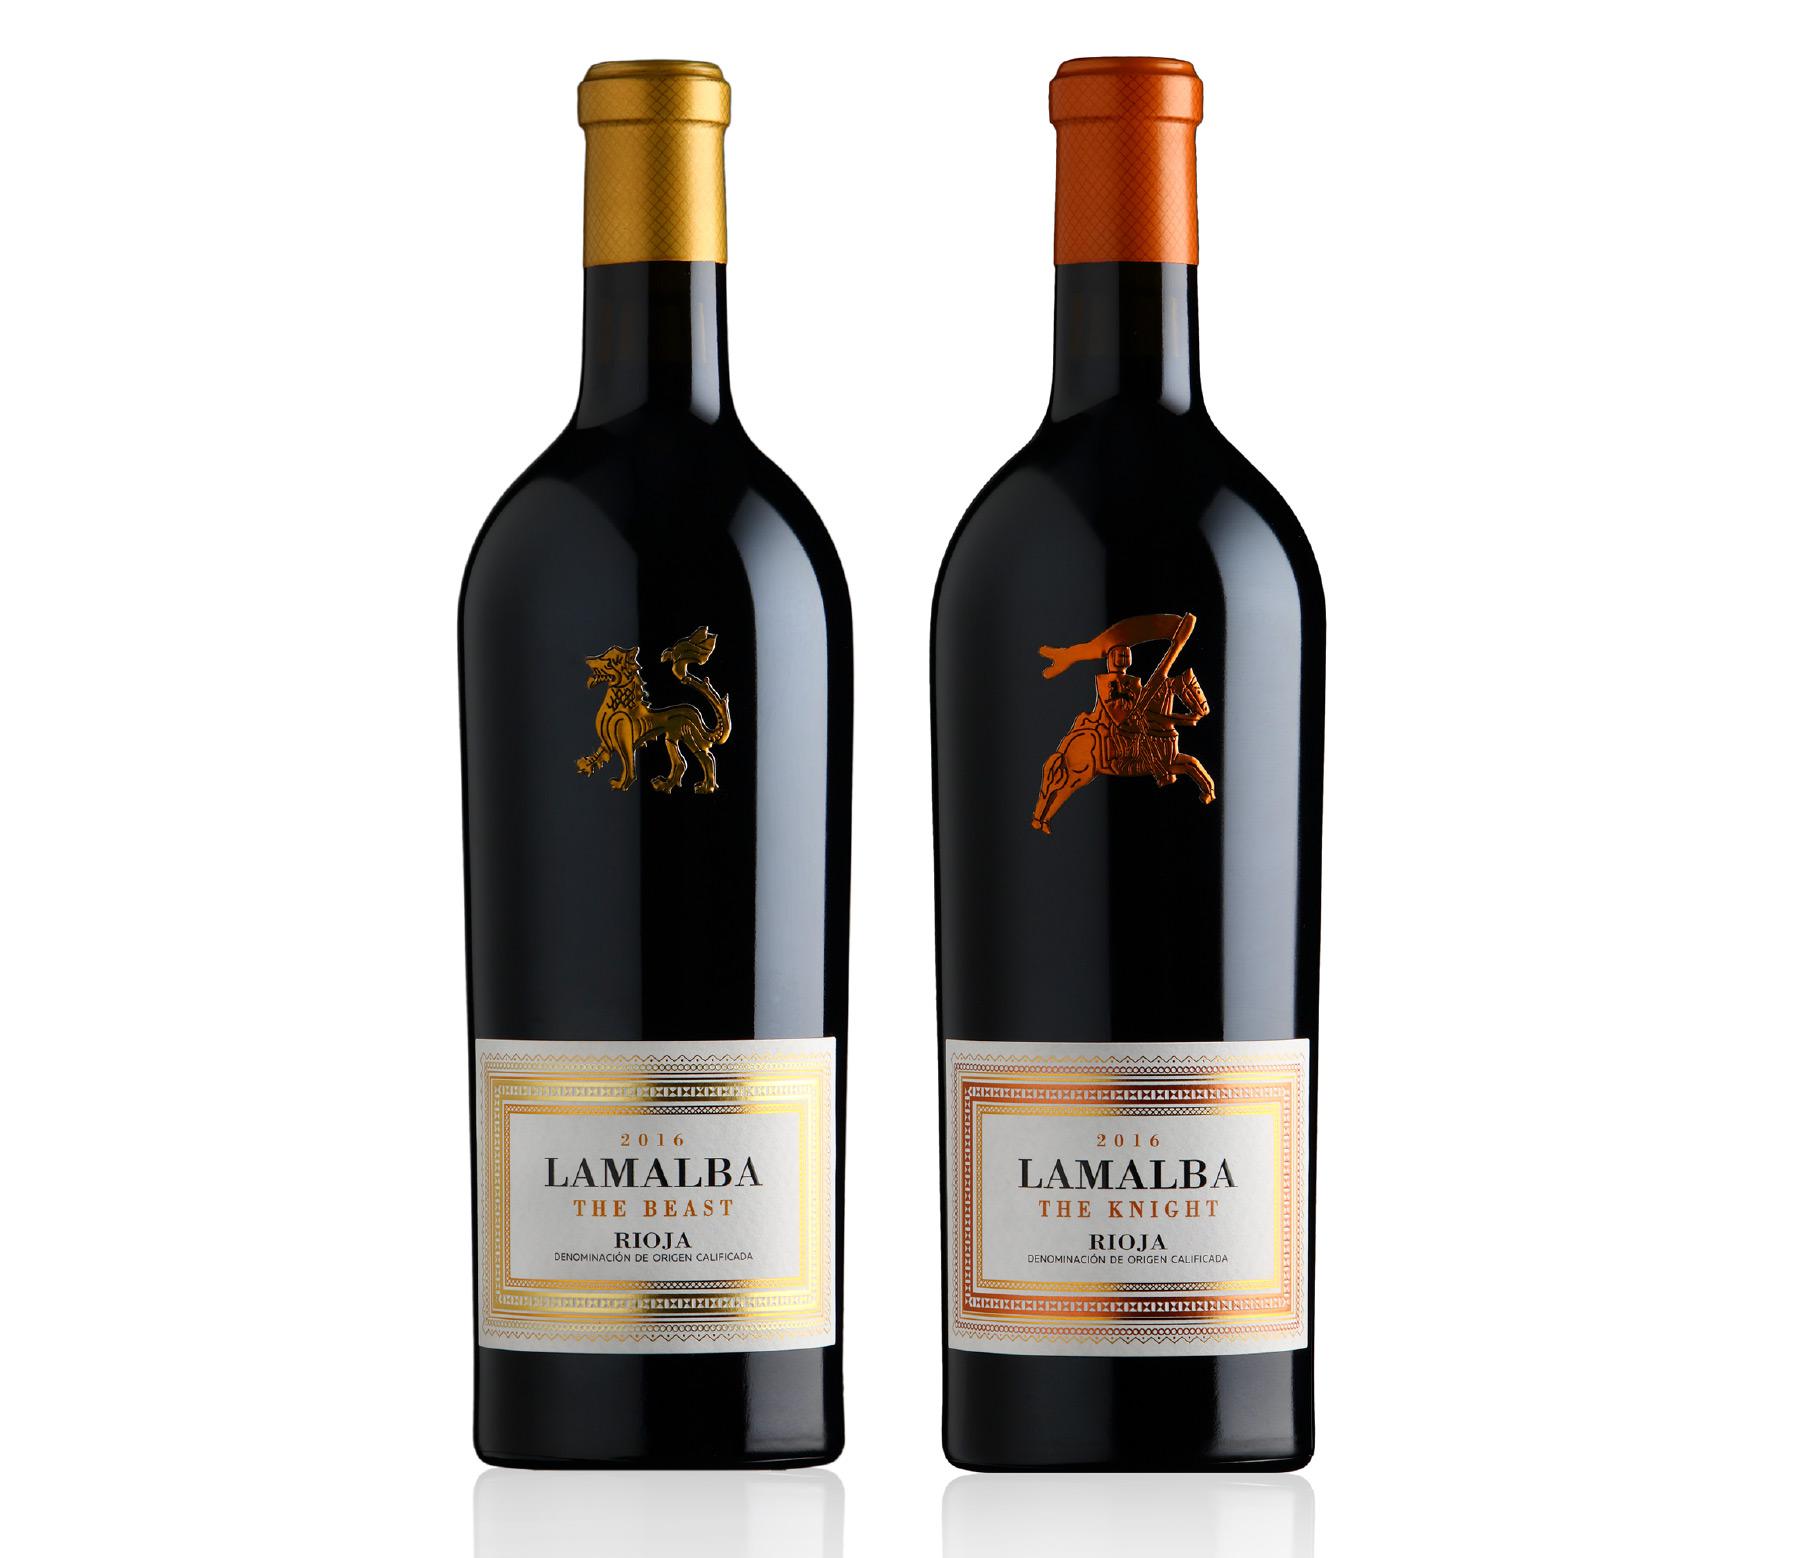 bodegas_santalba-lamalba-producto